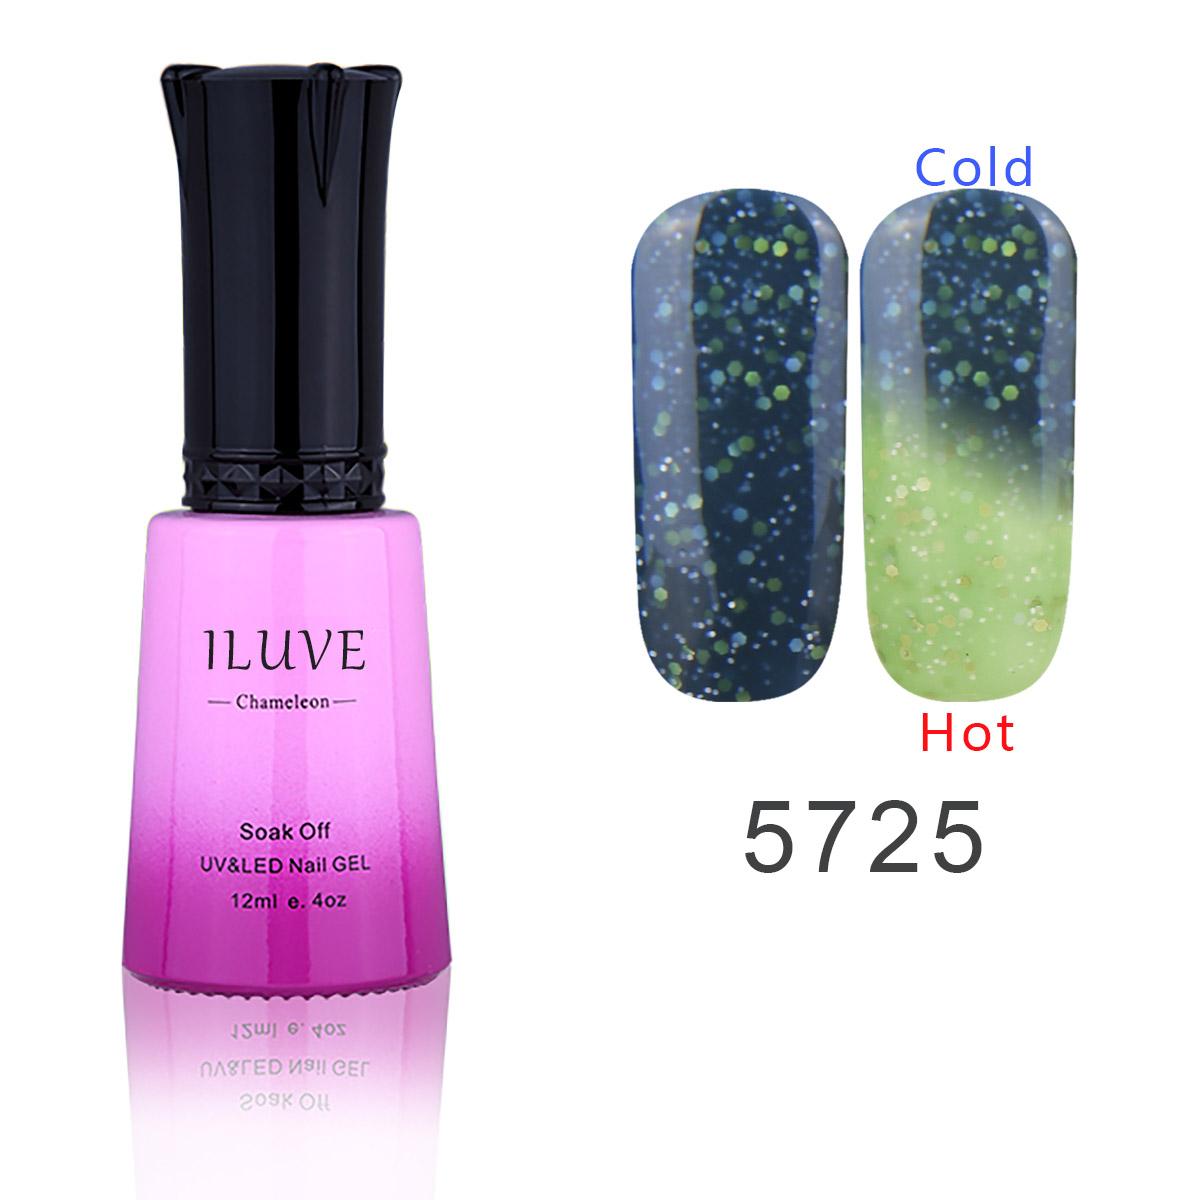 iluve led uv nail soak uv nail gel temperature change color gel nail gel salon